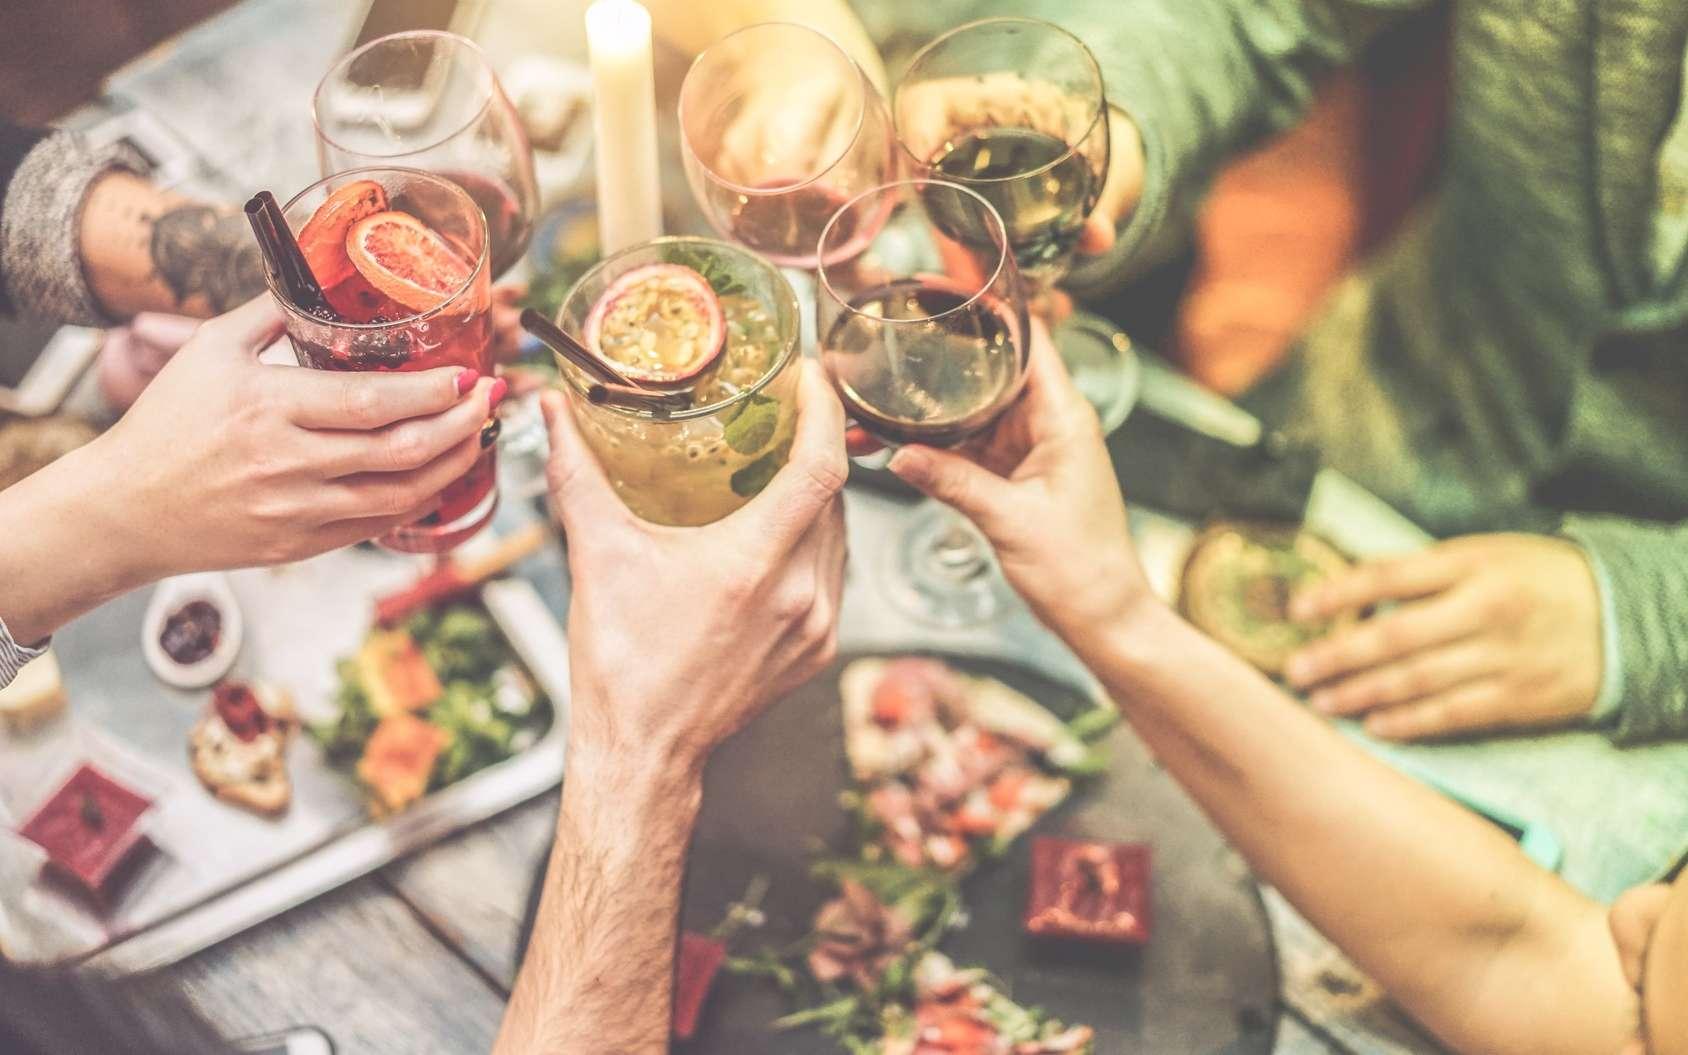 Nous buvons trop d'alcool en France. © DisobeyArt, Fotolia